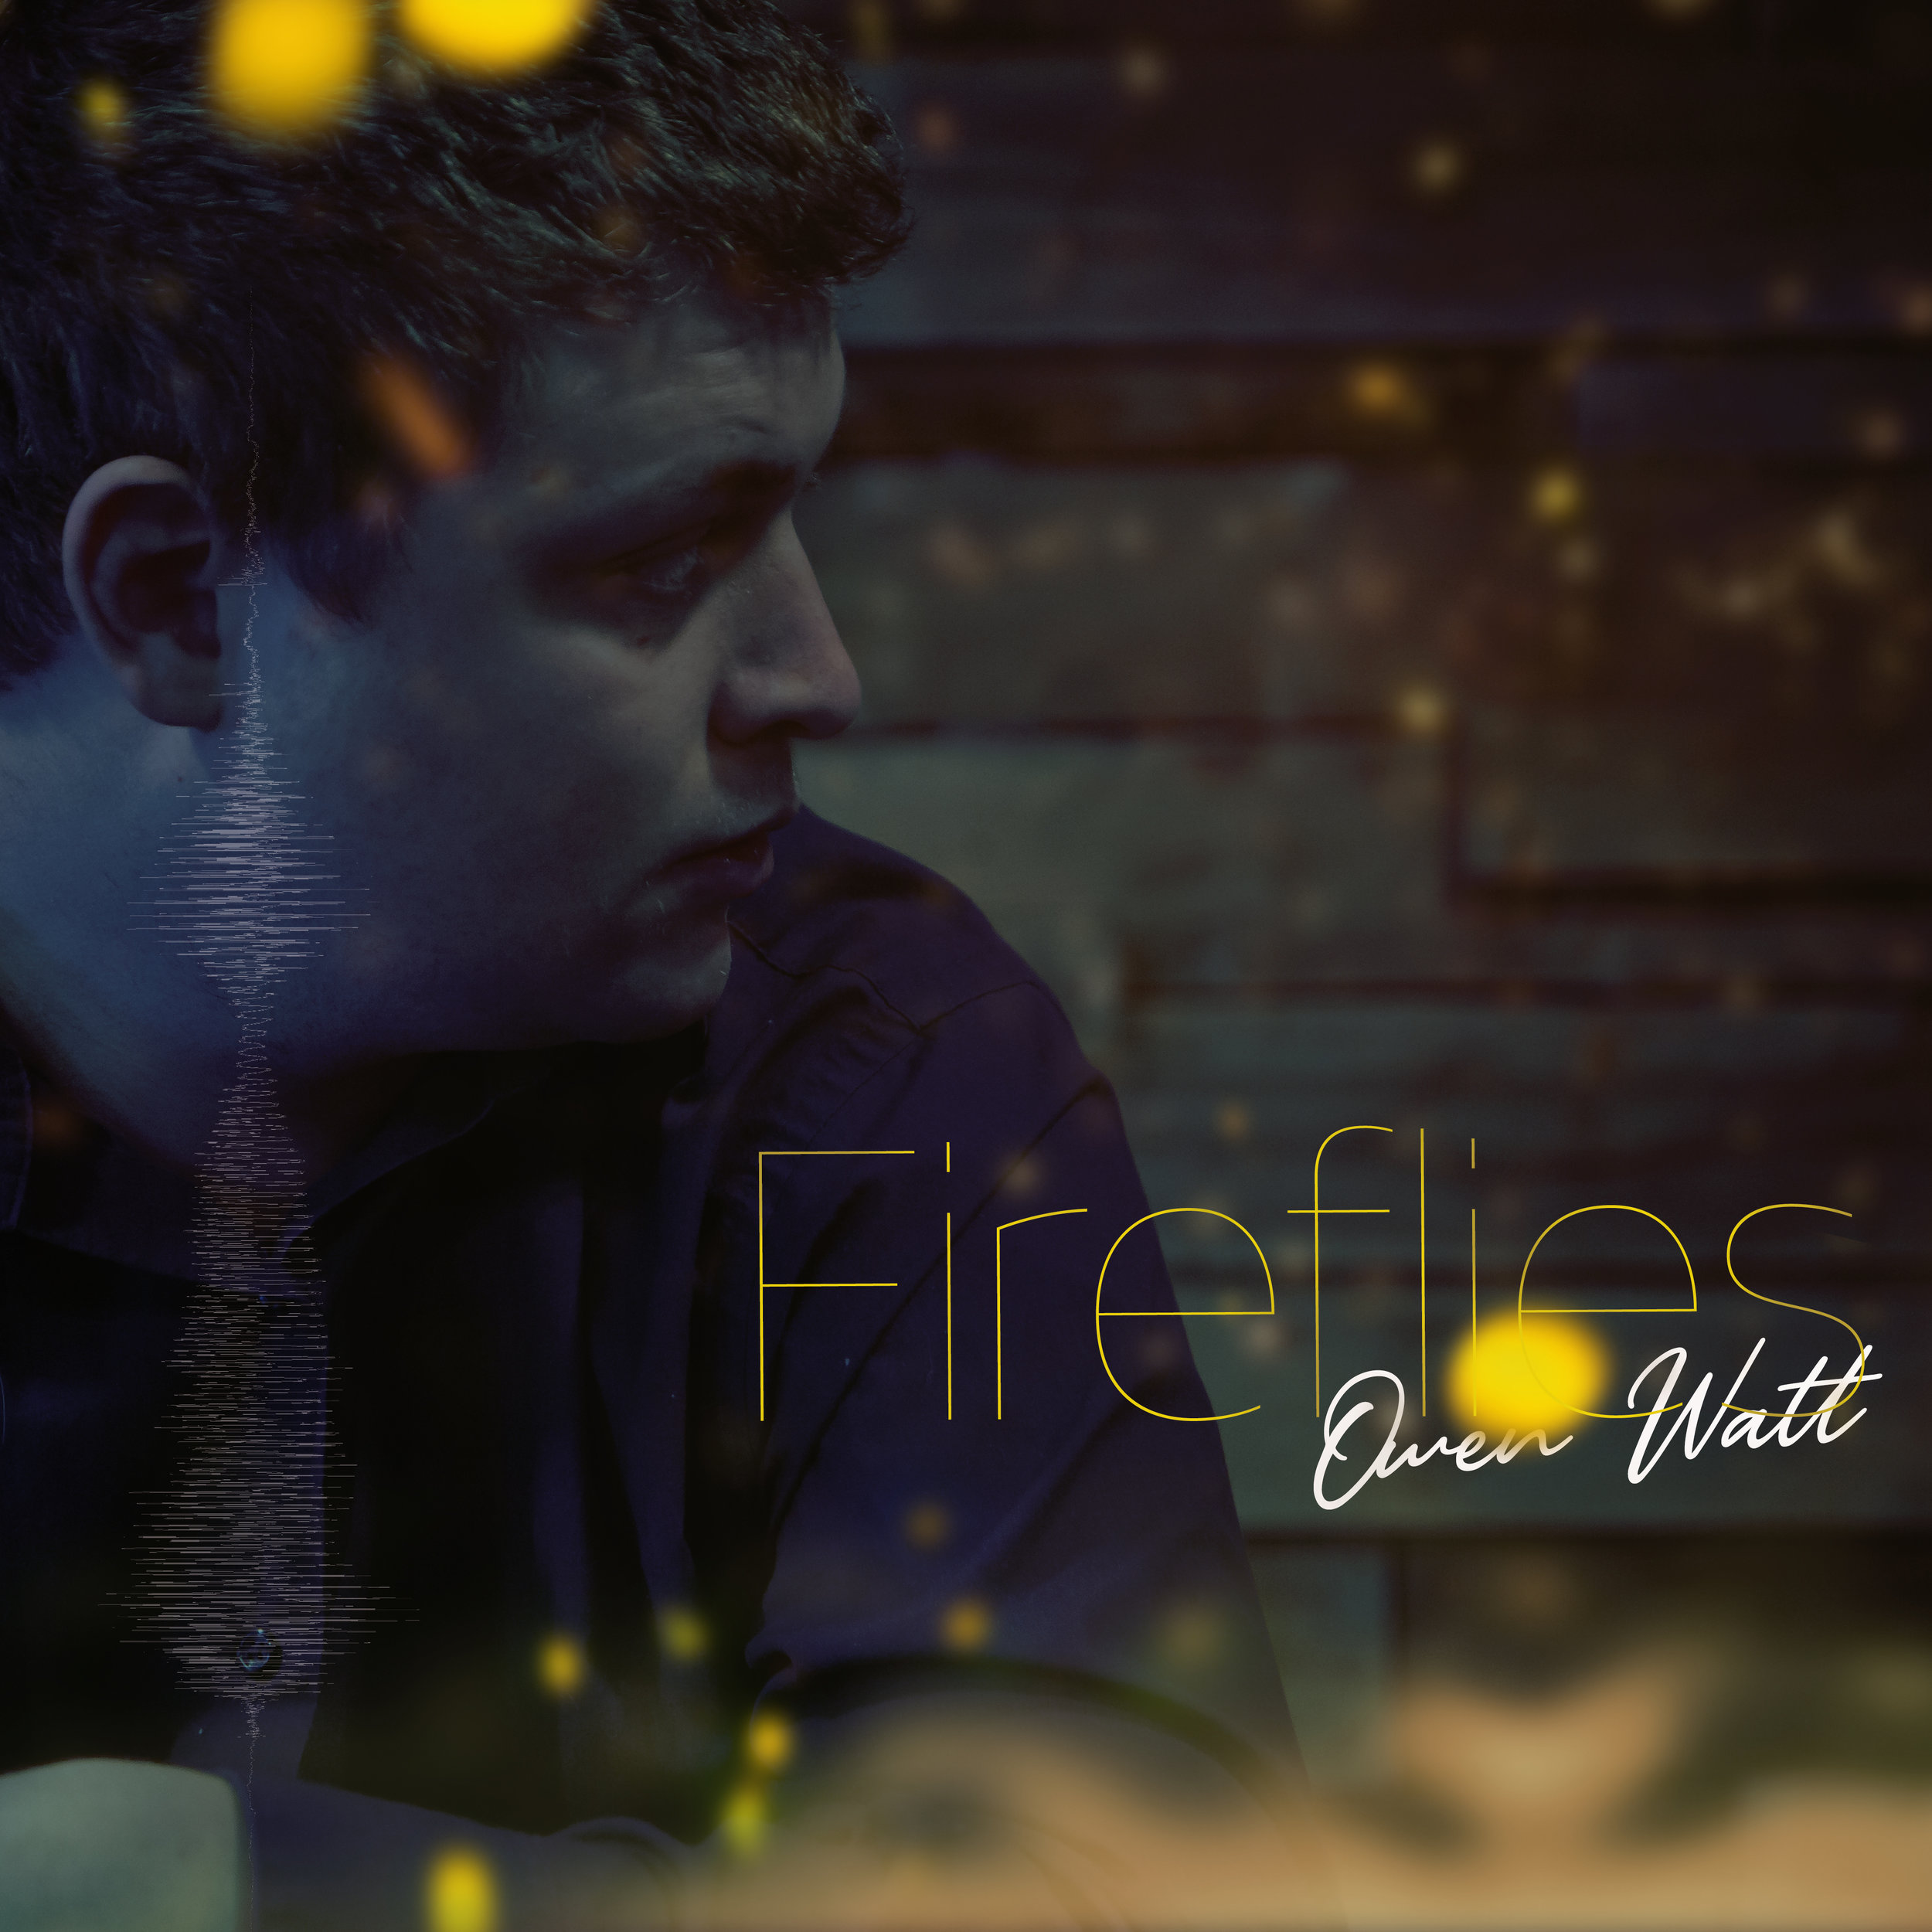 OwenWatt-Fireflies (1).jpg